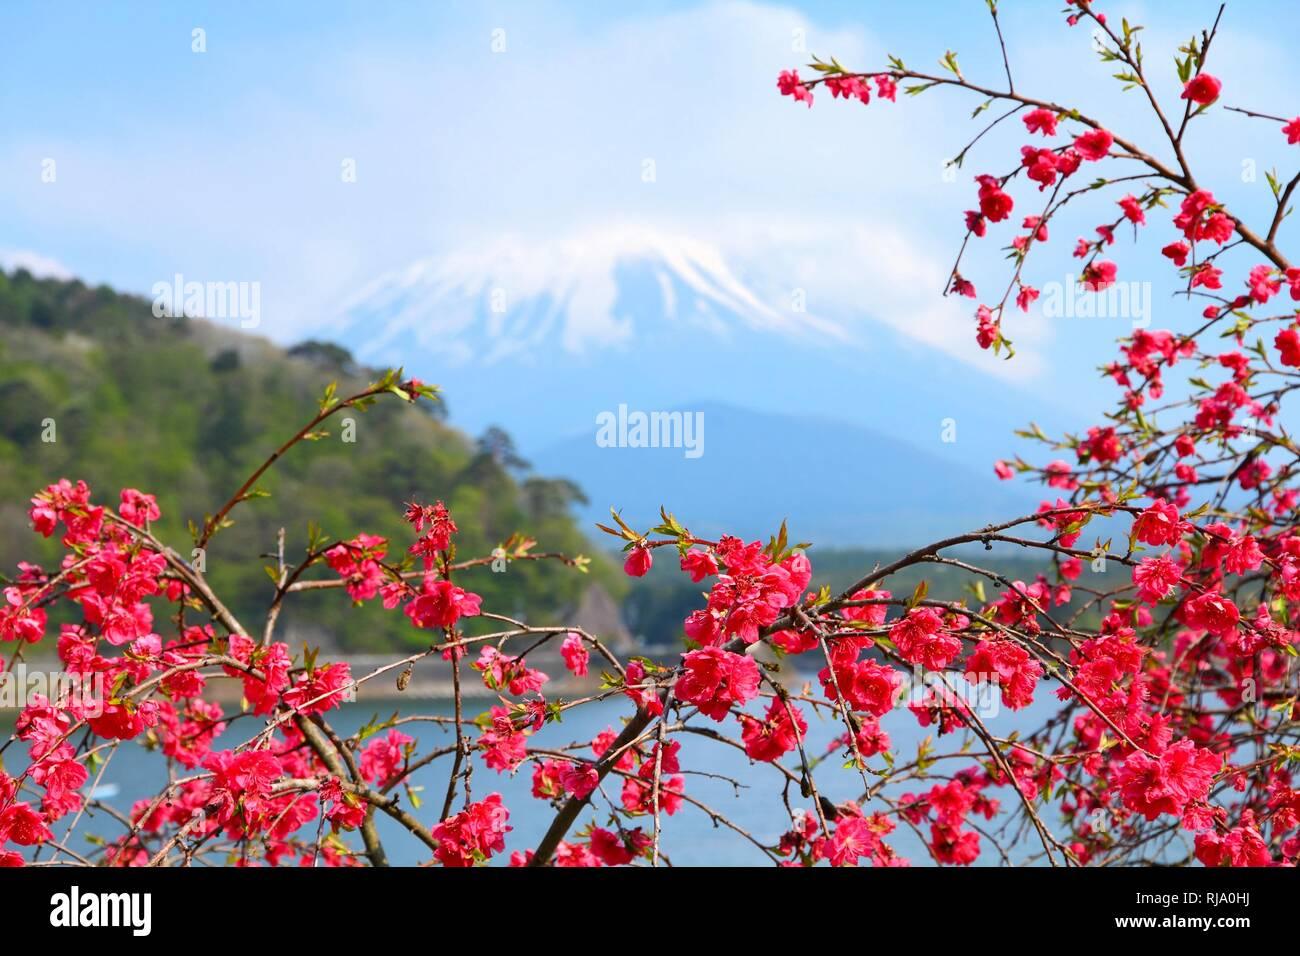 Japan Landschaft mit Berg Fuji in backgrond. Ume Pflaume Blüte. Teil von Fuji fünf Seen im Fuji-Hakone-Izu Nationalpark Stockbild